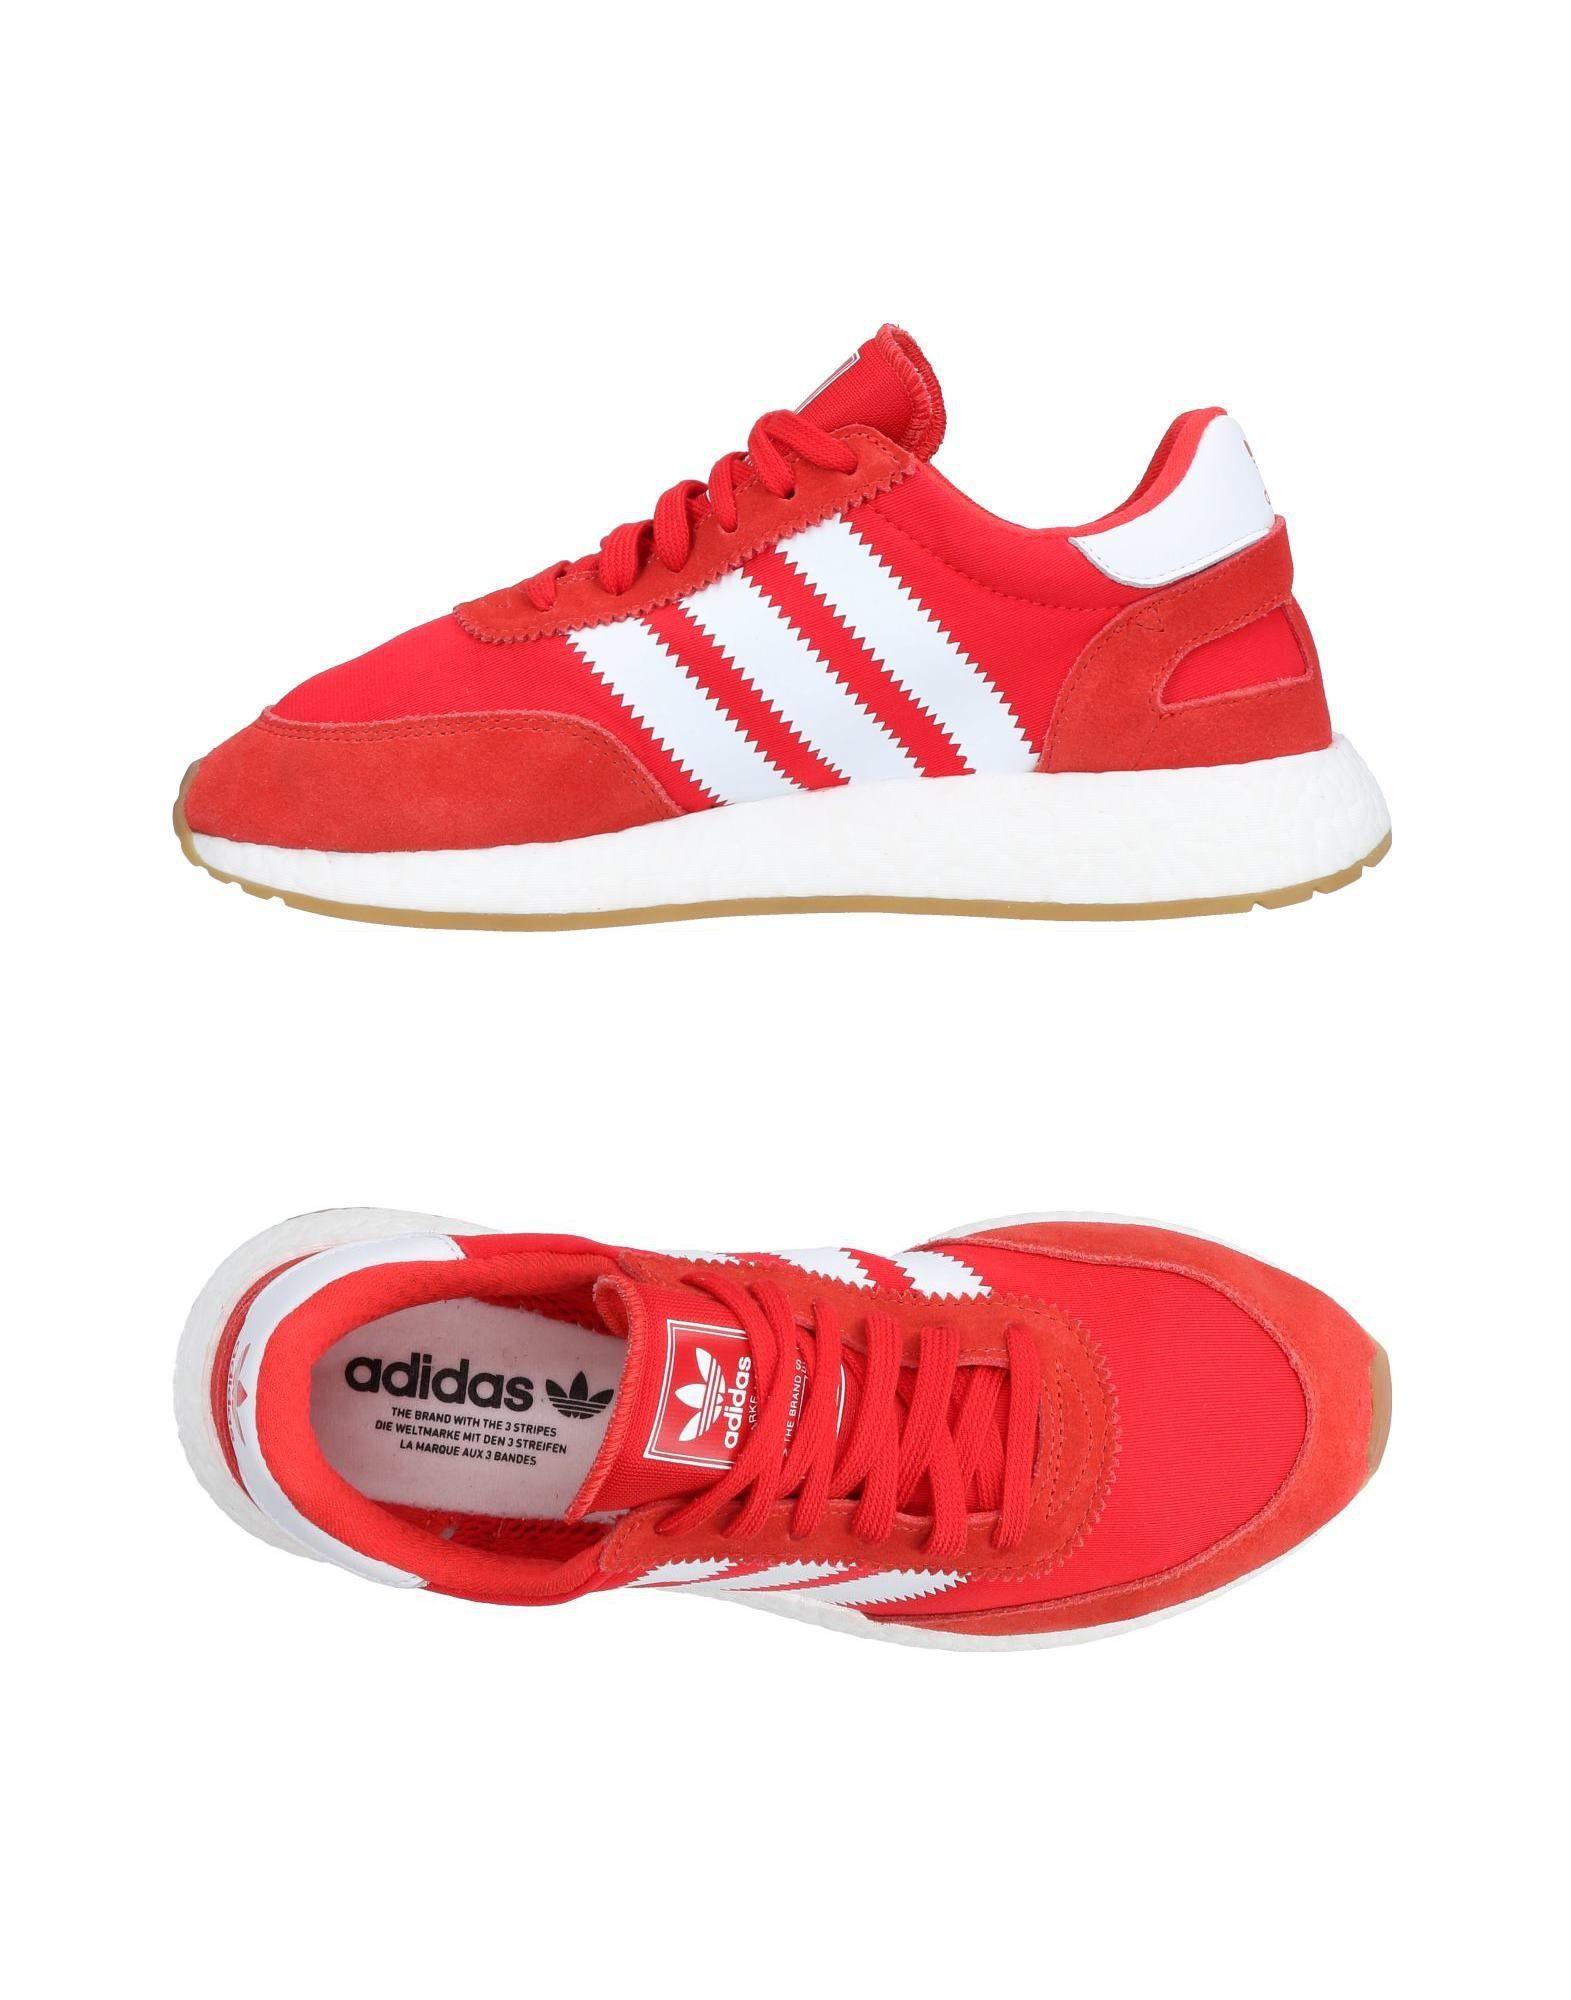 Adidas Originals Sneakers - Men Adidas Originals Canada Sneakers online on  Canada Originals - 11461892AX 8e04c1